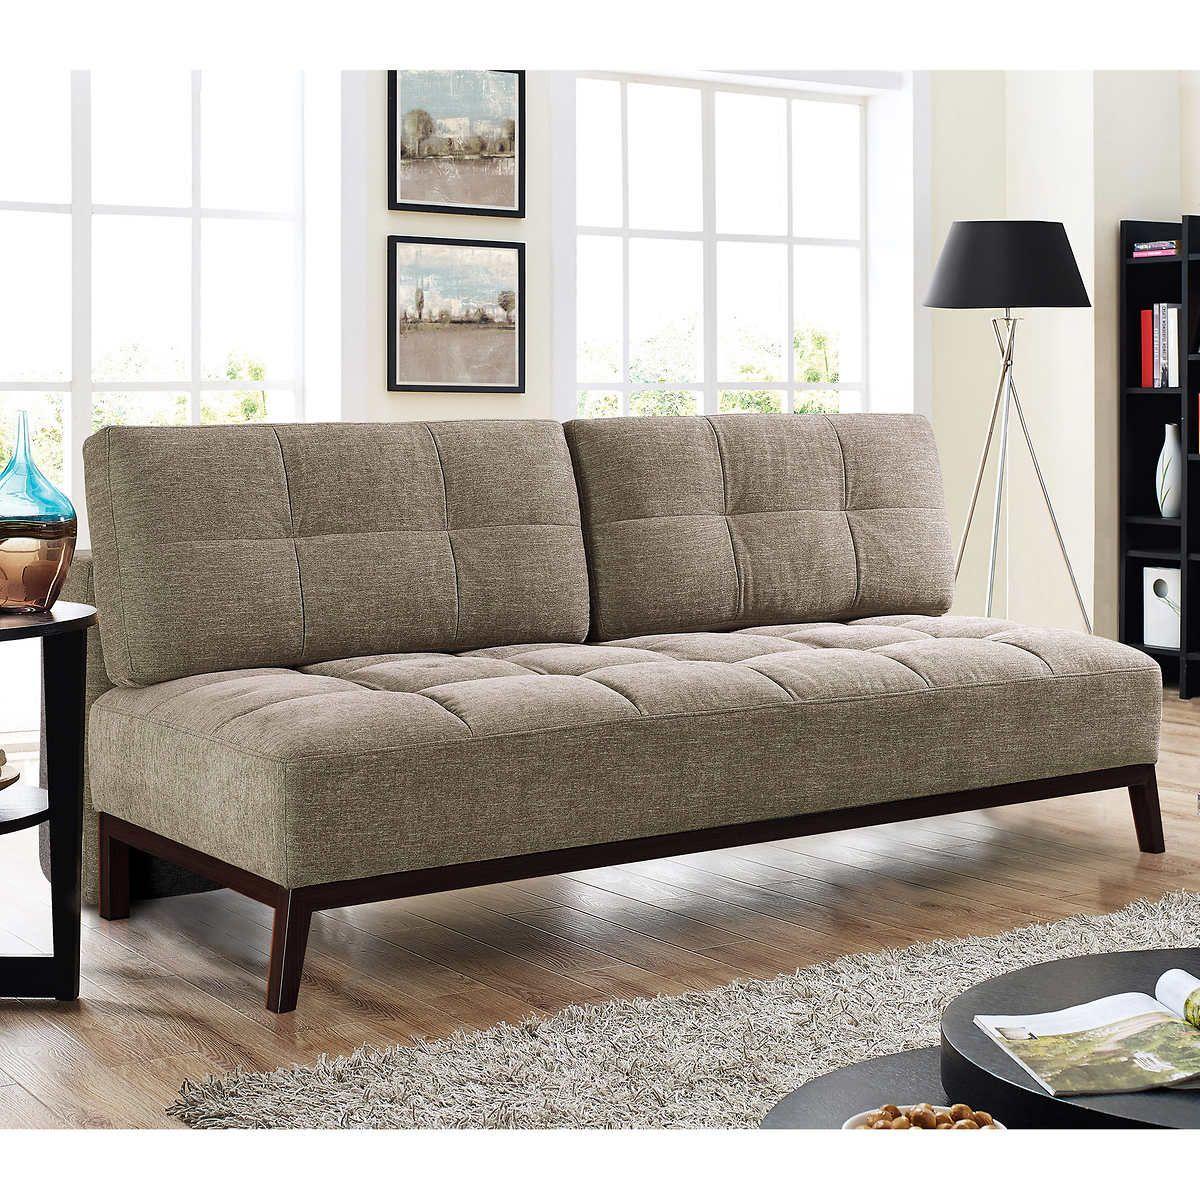 Costco Beautyrest fabric sleeper sofa for living room